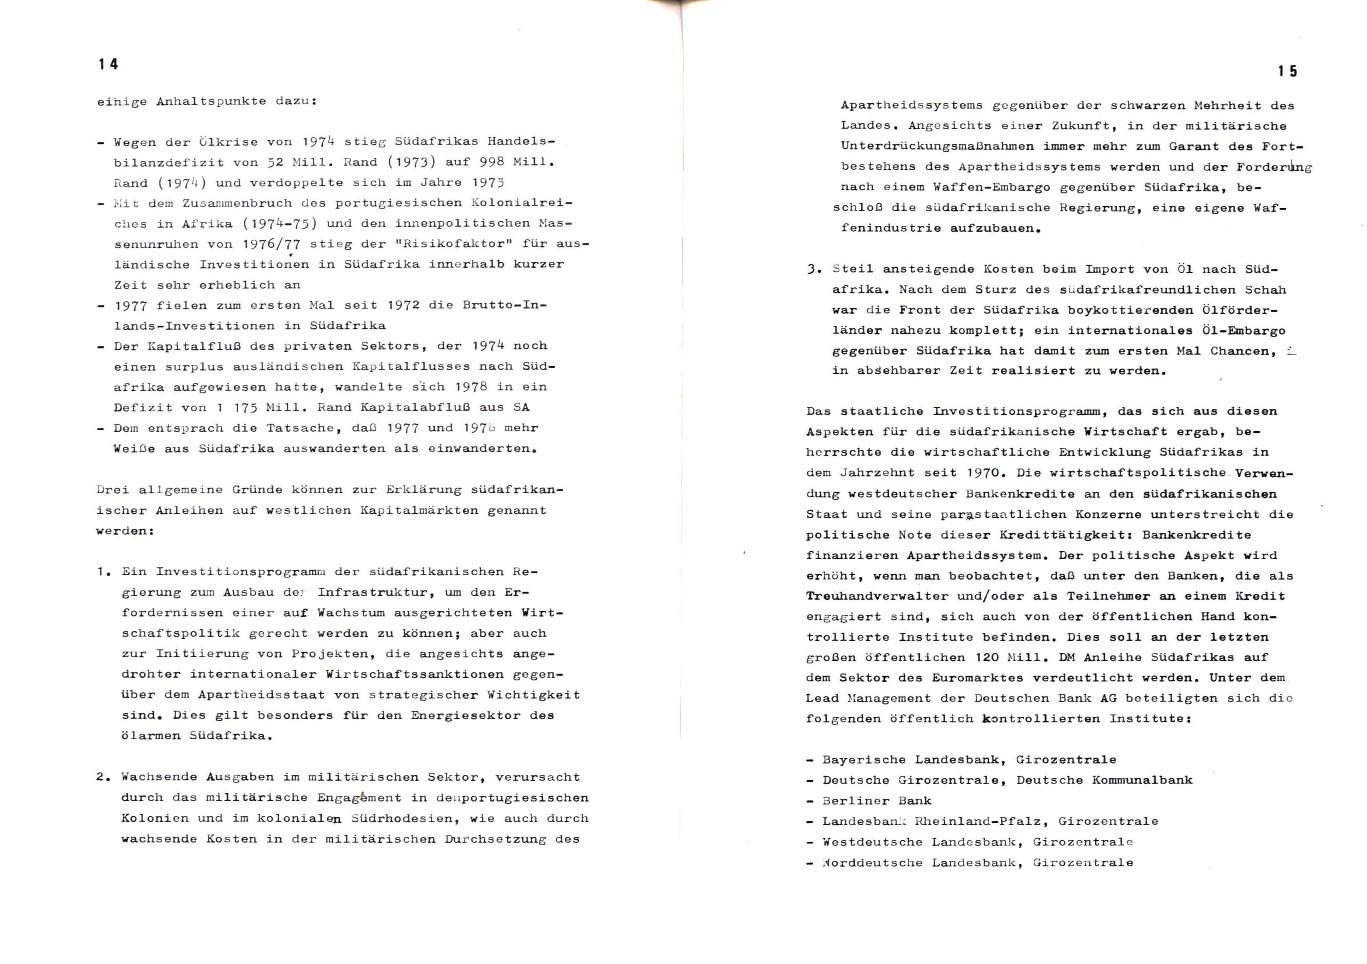 Muenster_AKAFRIK_1981_Suedafrika_BRD_09